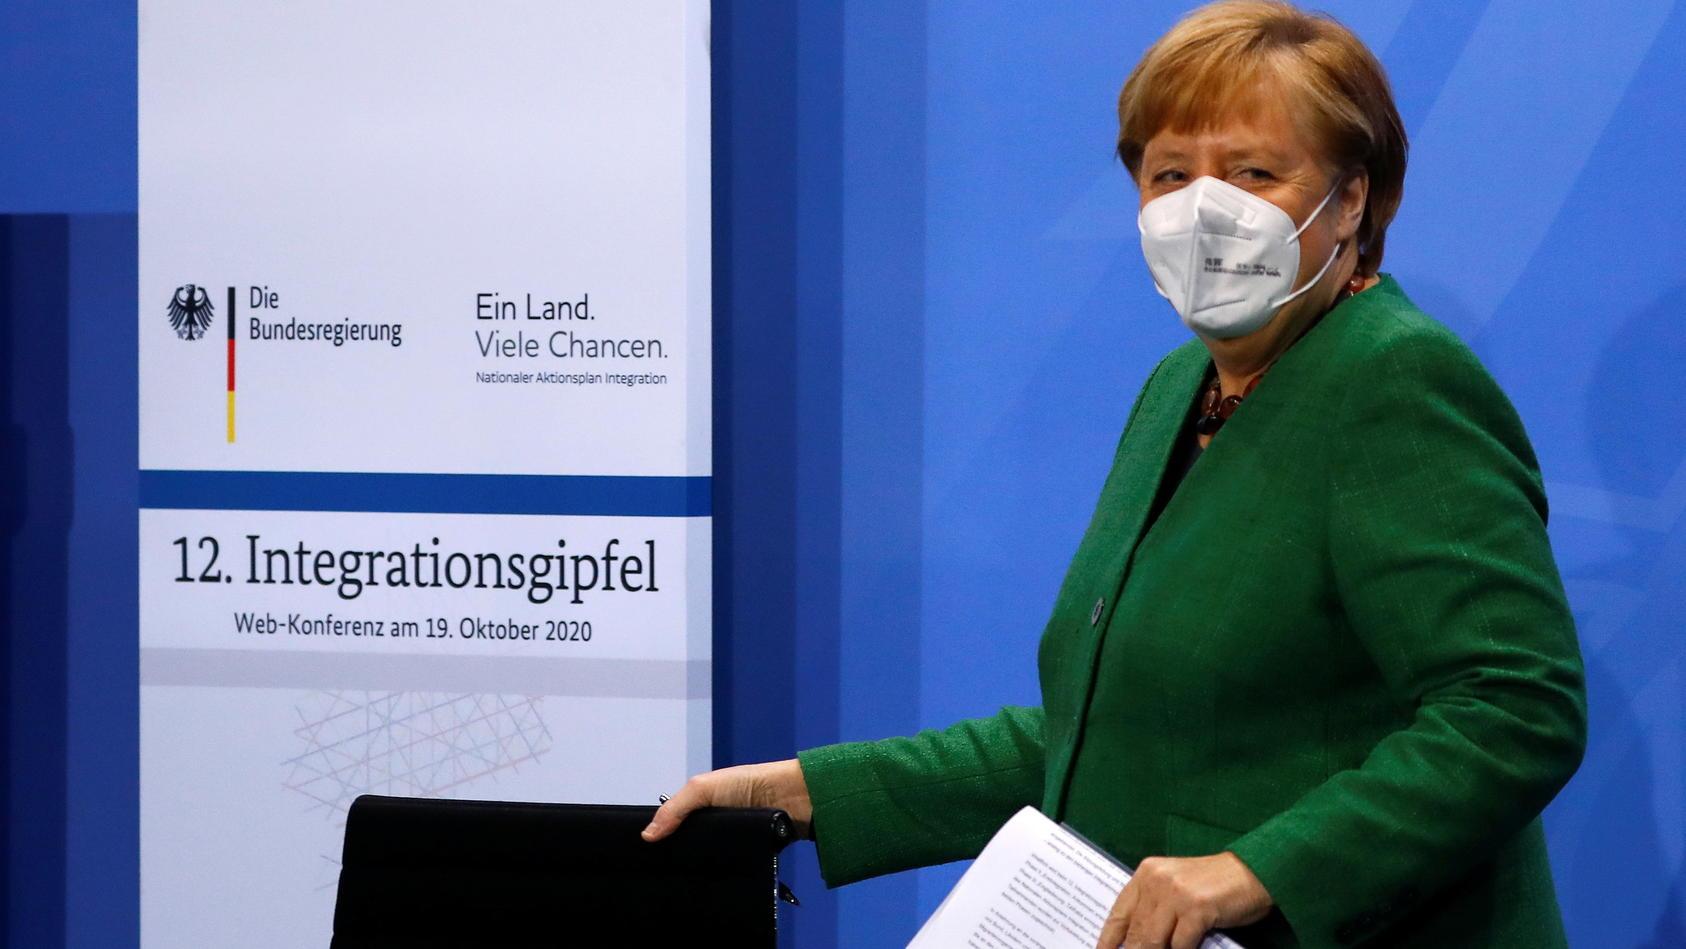 12. Integrationsgipfel bei Bundeskanzlerin Angela Merkel